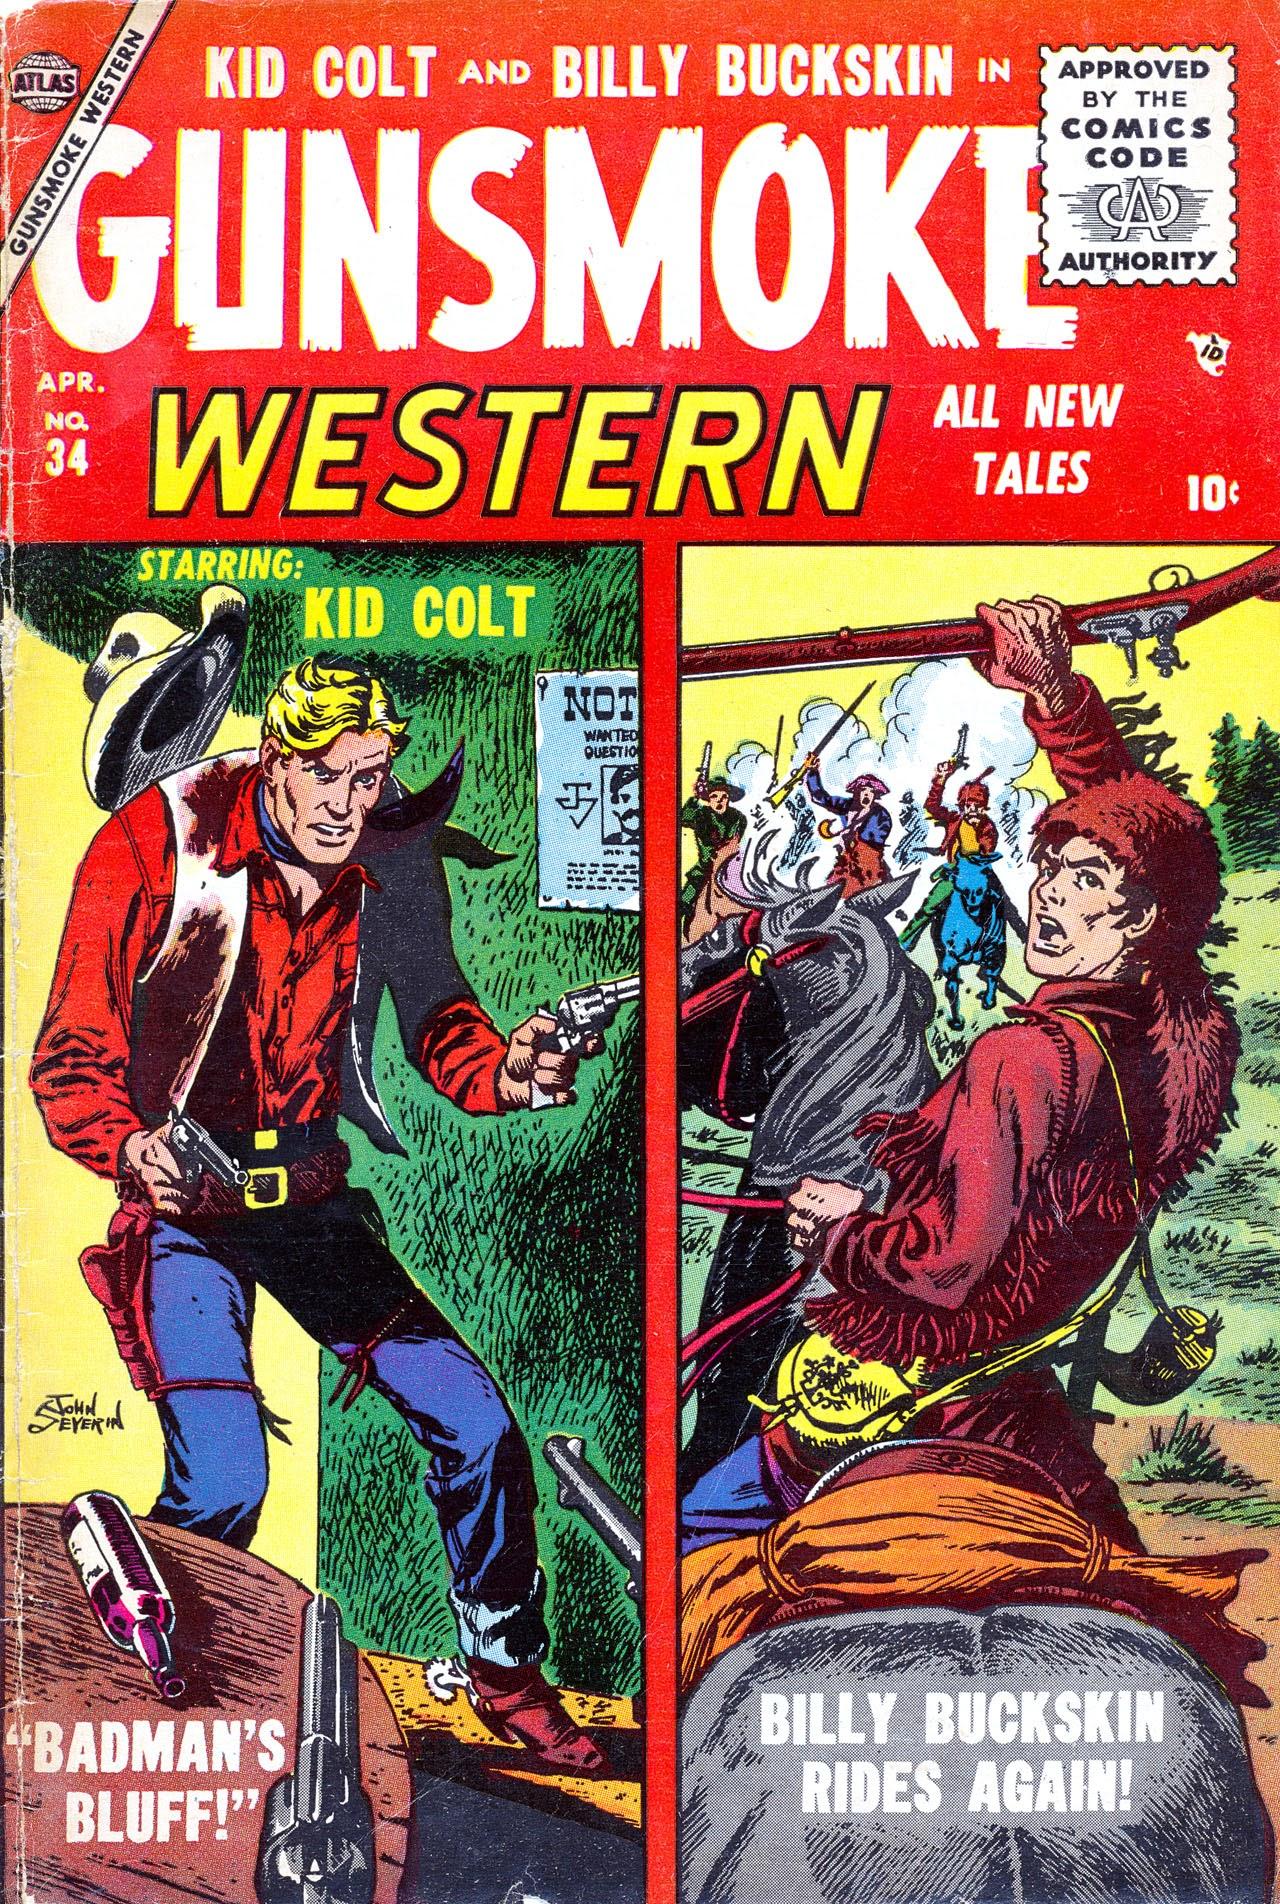 Gunsmoke Western 34 Page 1